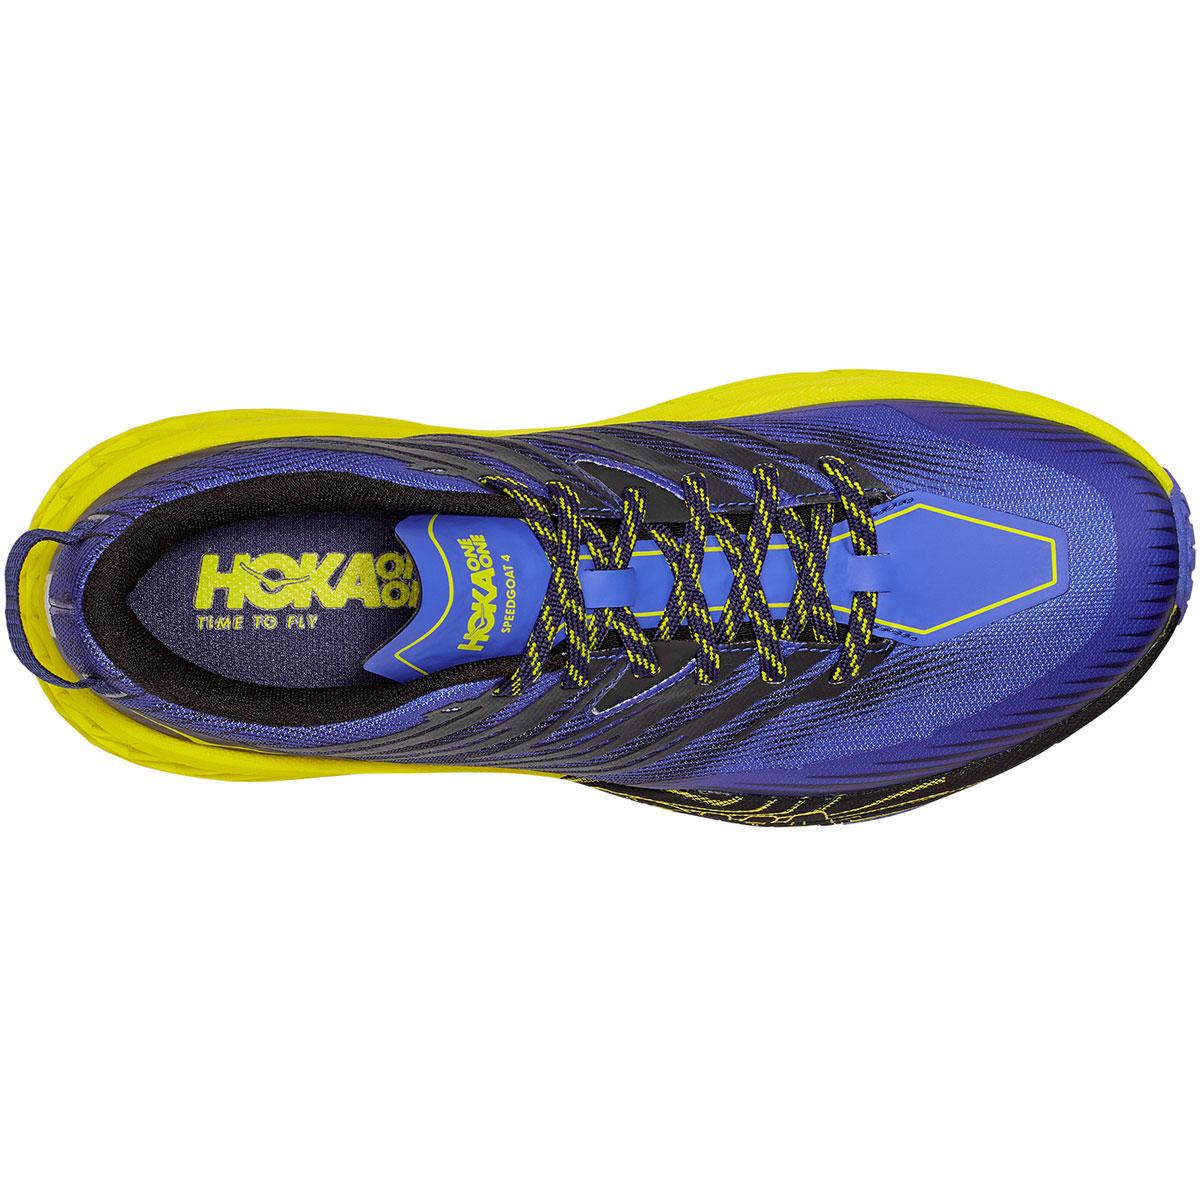 Men's Hoka One One Speedgoat 4 Trail Running Shoe - Color: Black Iris/Evening Primrose - Size: 7 - Width: Regular, Black Iris/Evening Primrose, large, image 4